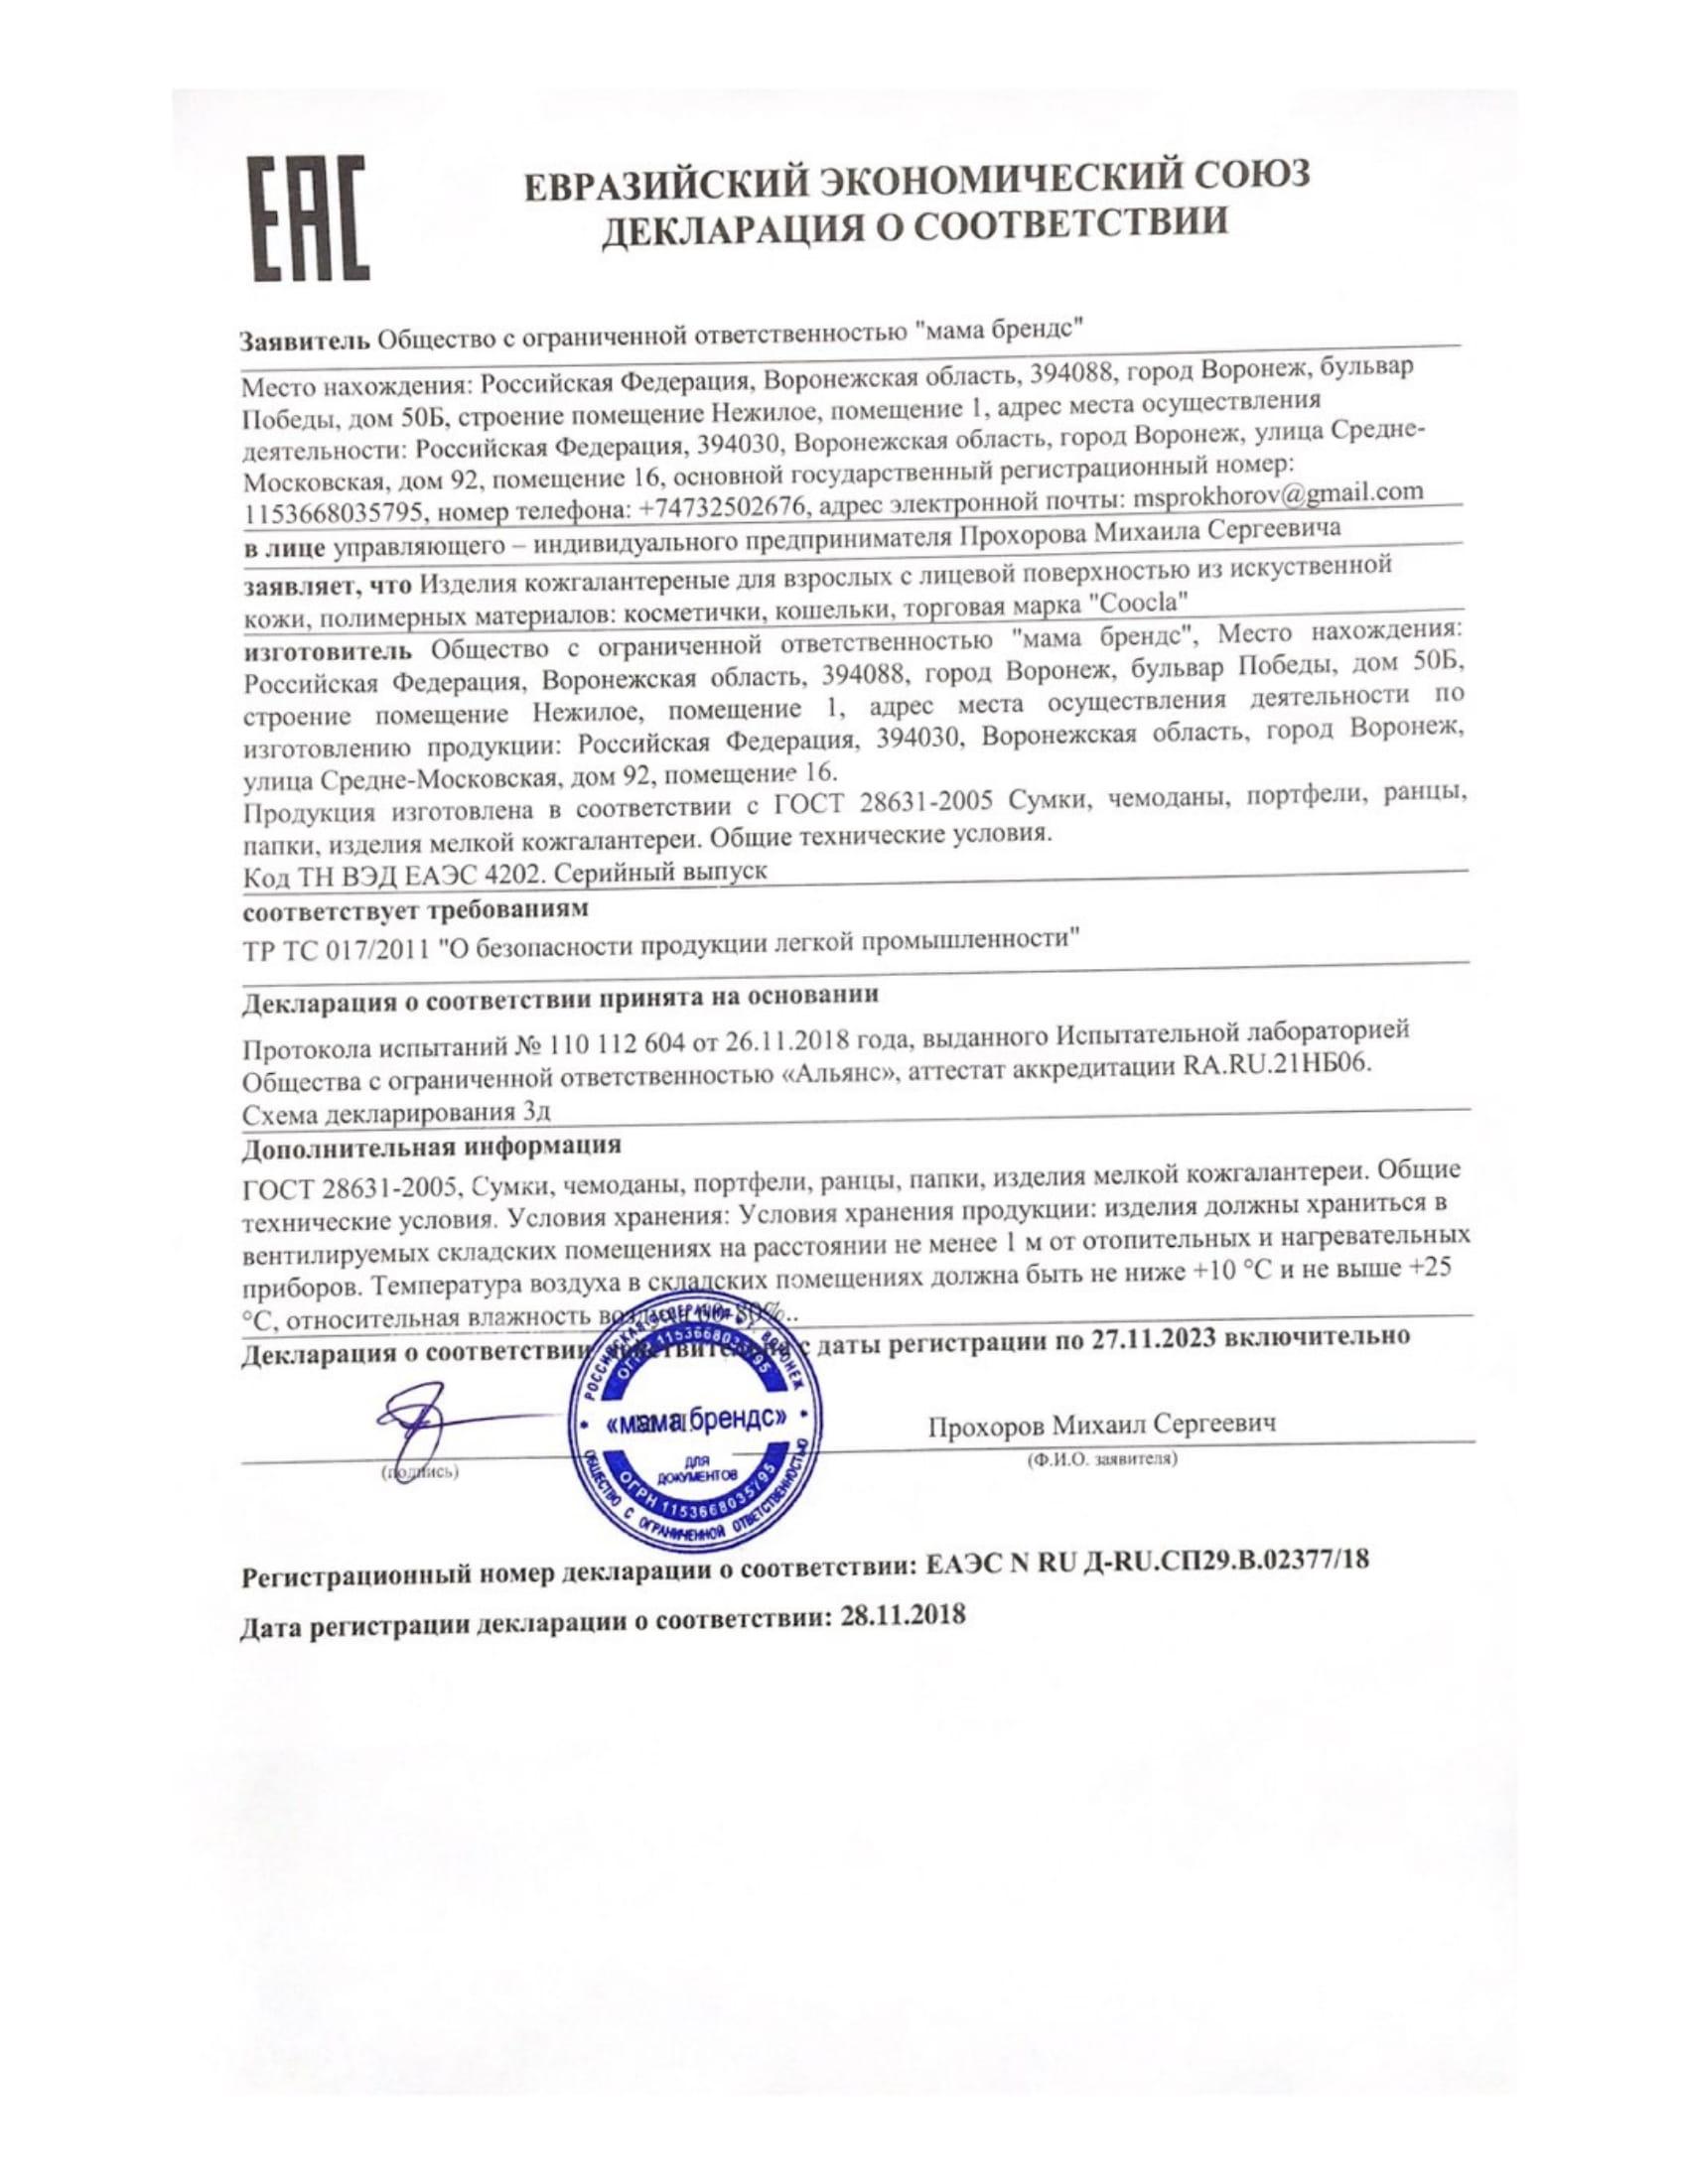 ЕАЭС N RU Д-RU.СП29.В.02377-18-1